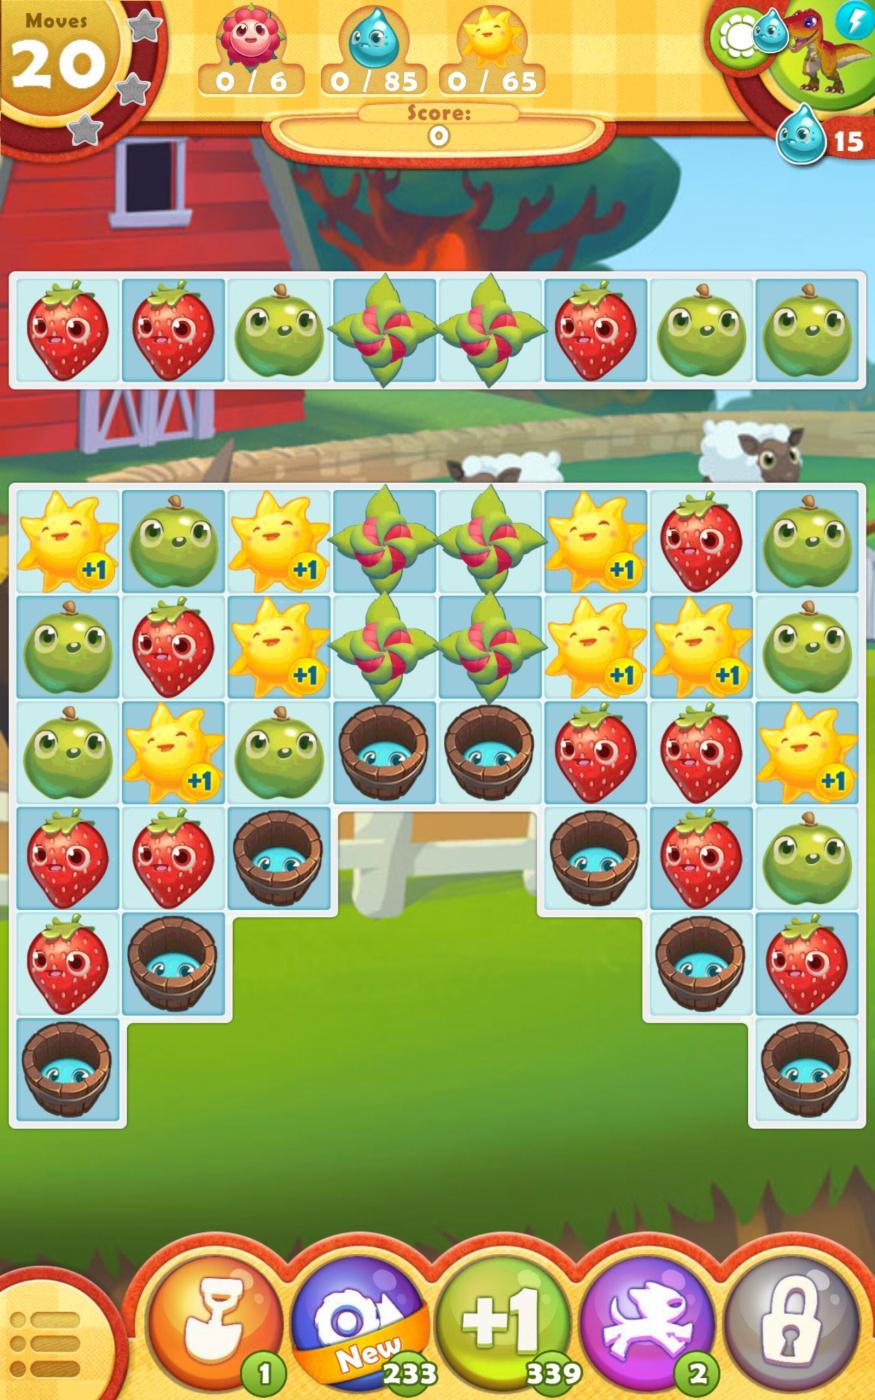 Farm_Heroes_Saga_2020-04-01-21-44-52[1].jpg